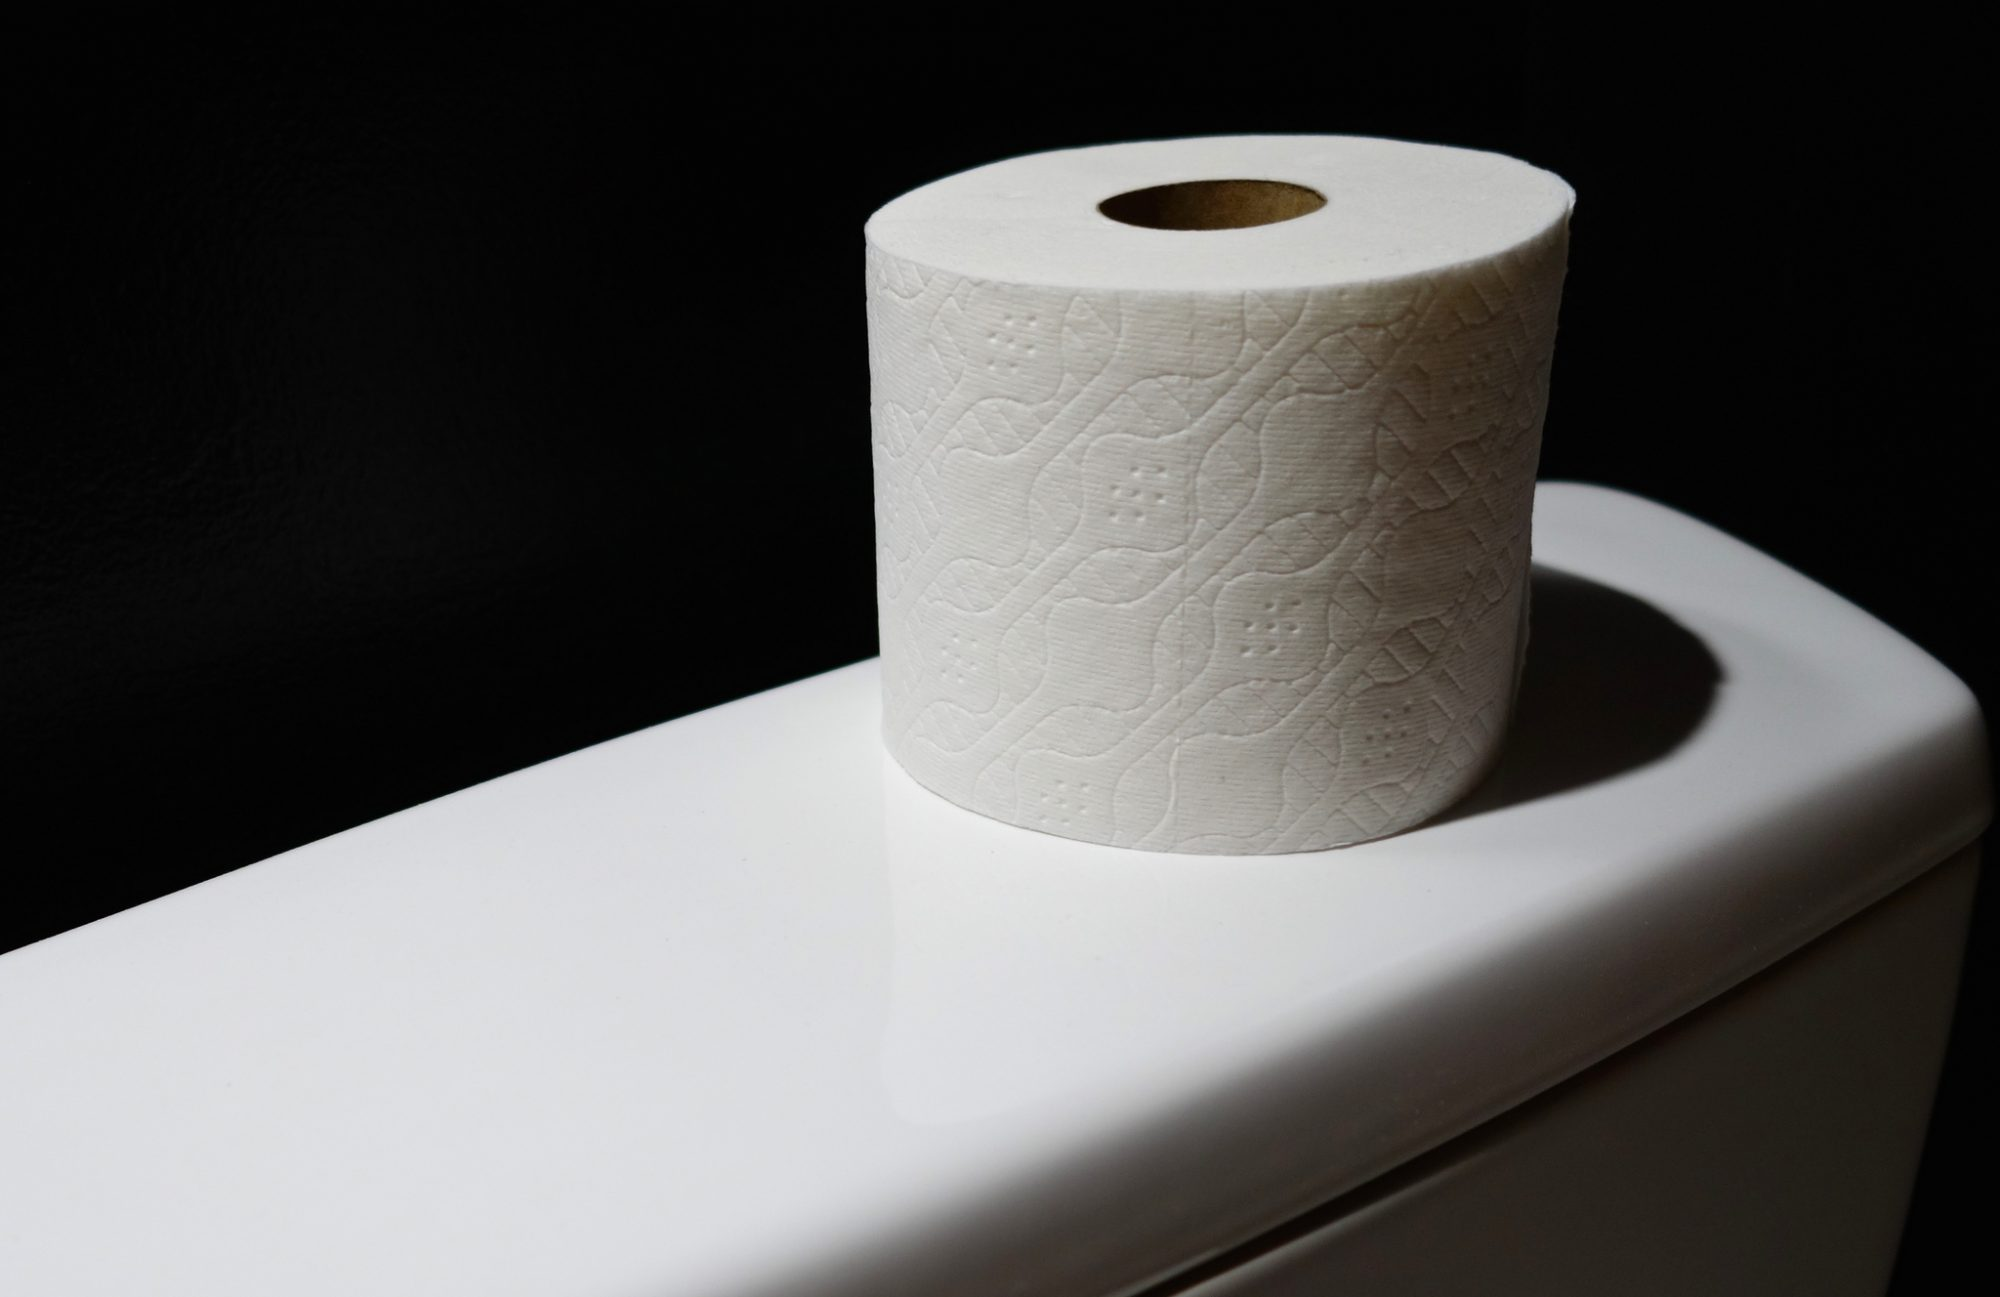 EC: Italy Now Has Toilet Paper Made of Milk